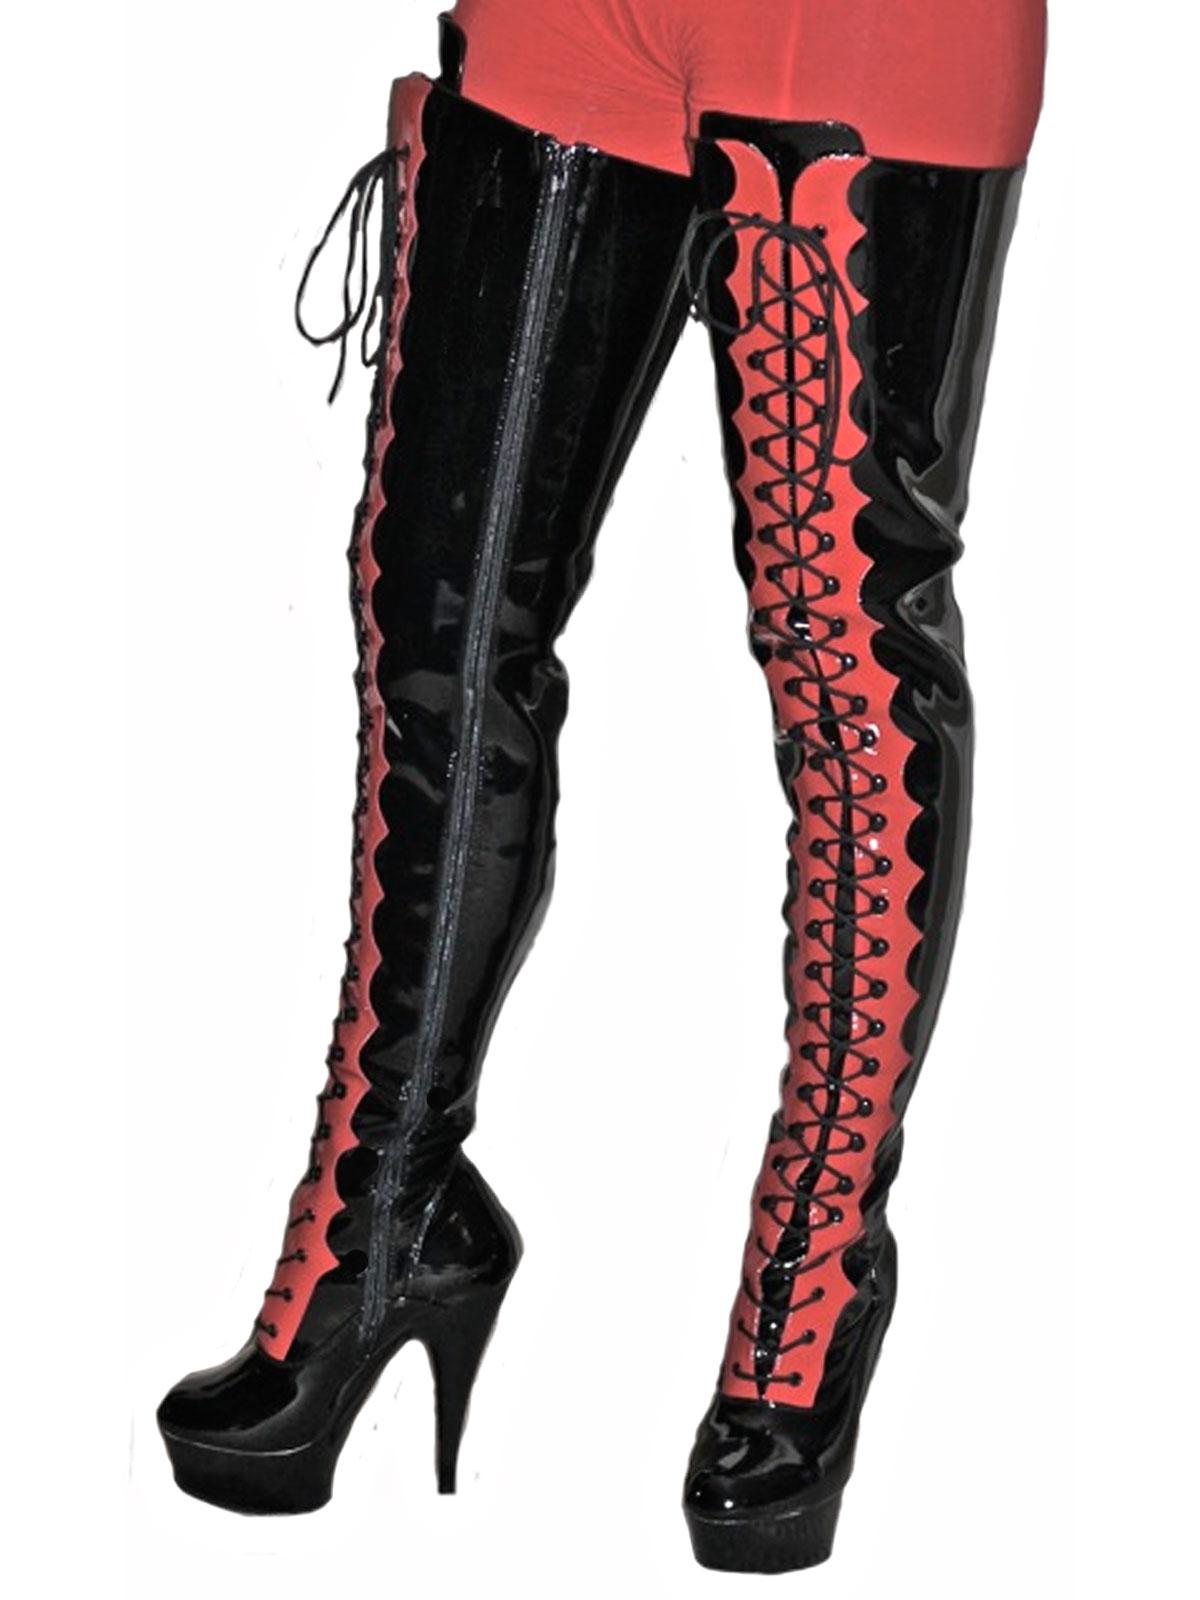 Pleaser Thigh High Boots, Black Red Patent High Heel - Tout Ensemble